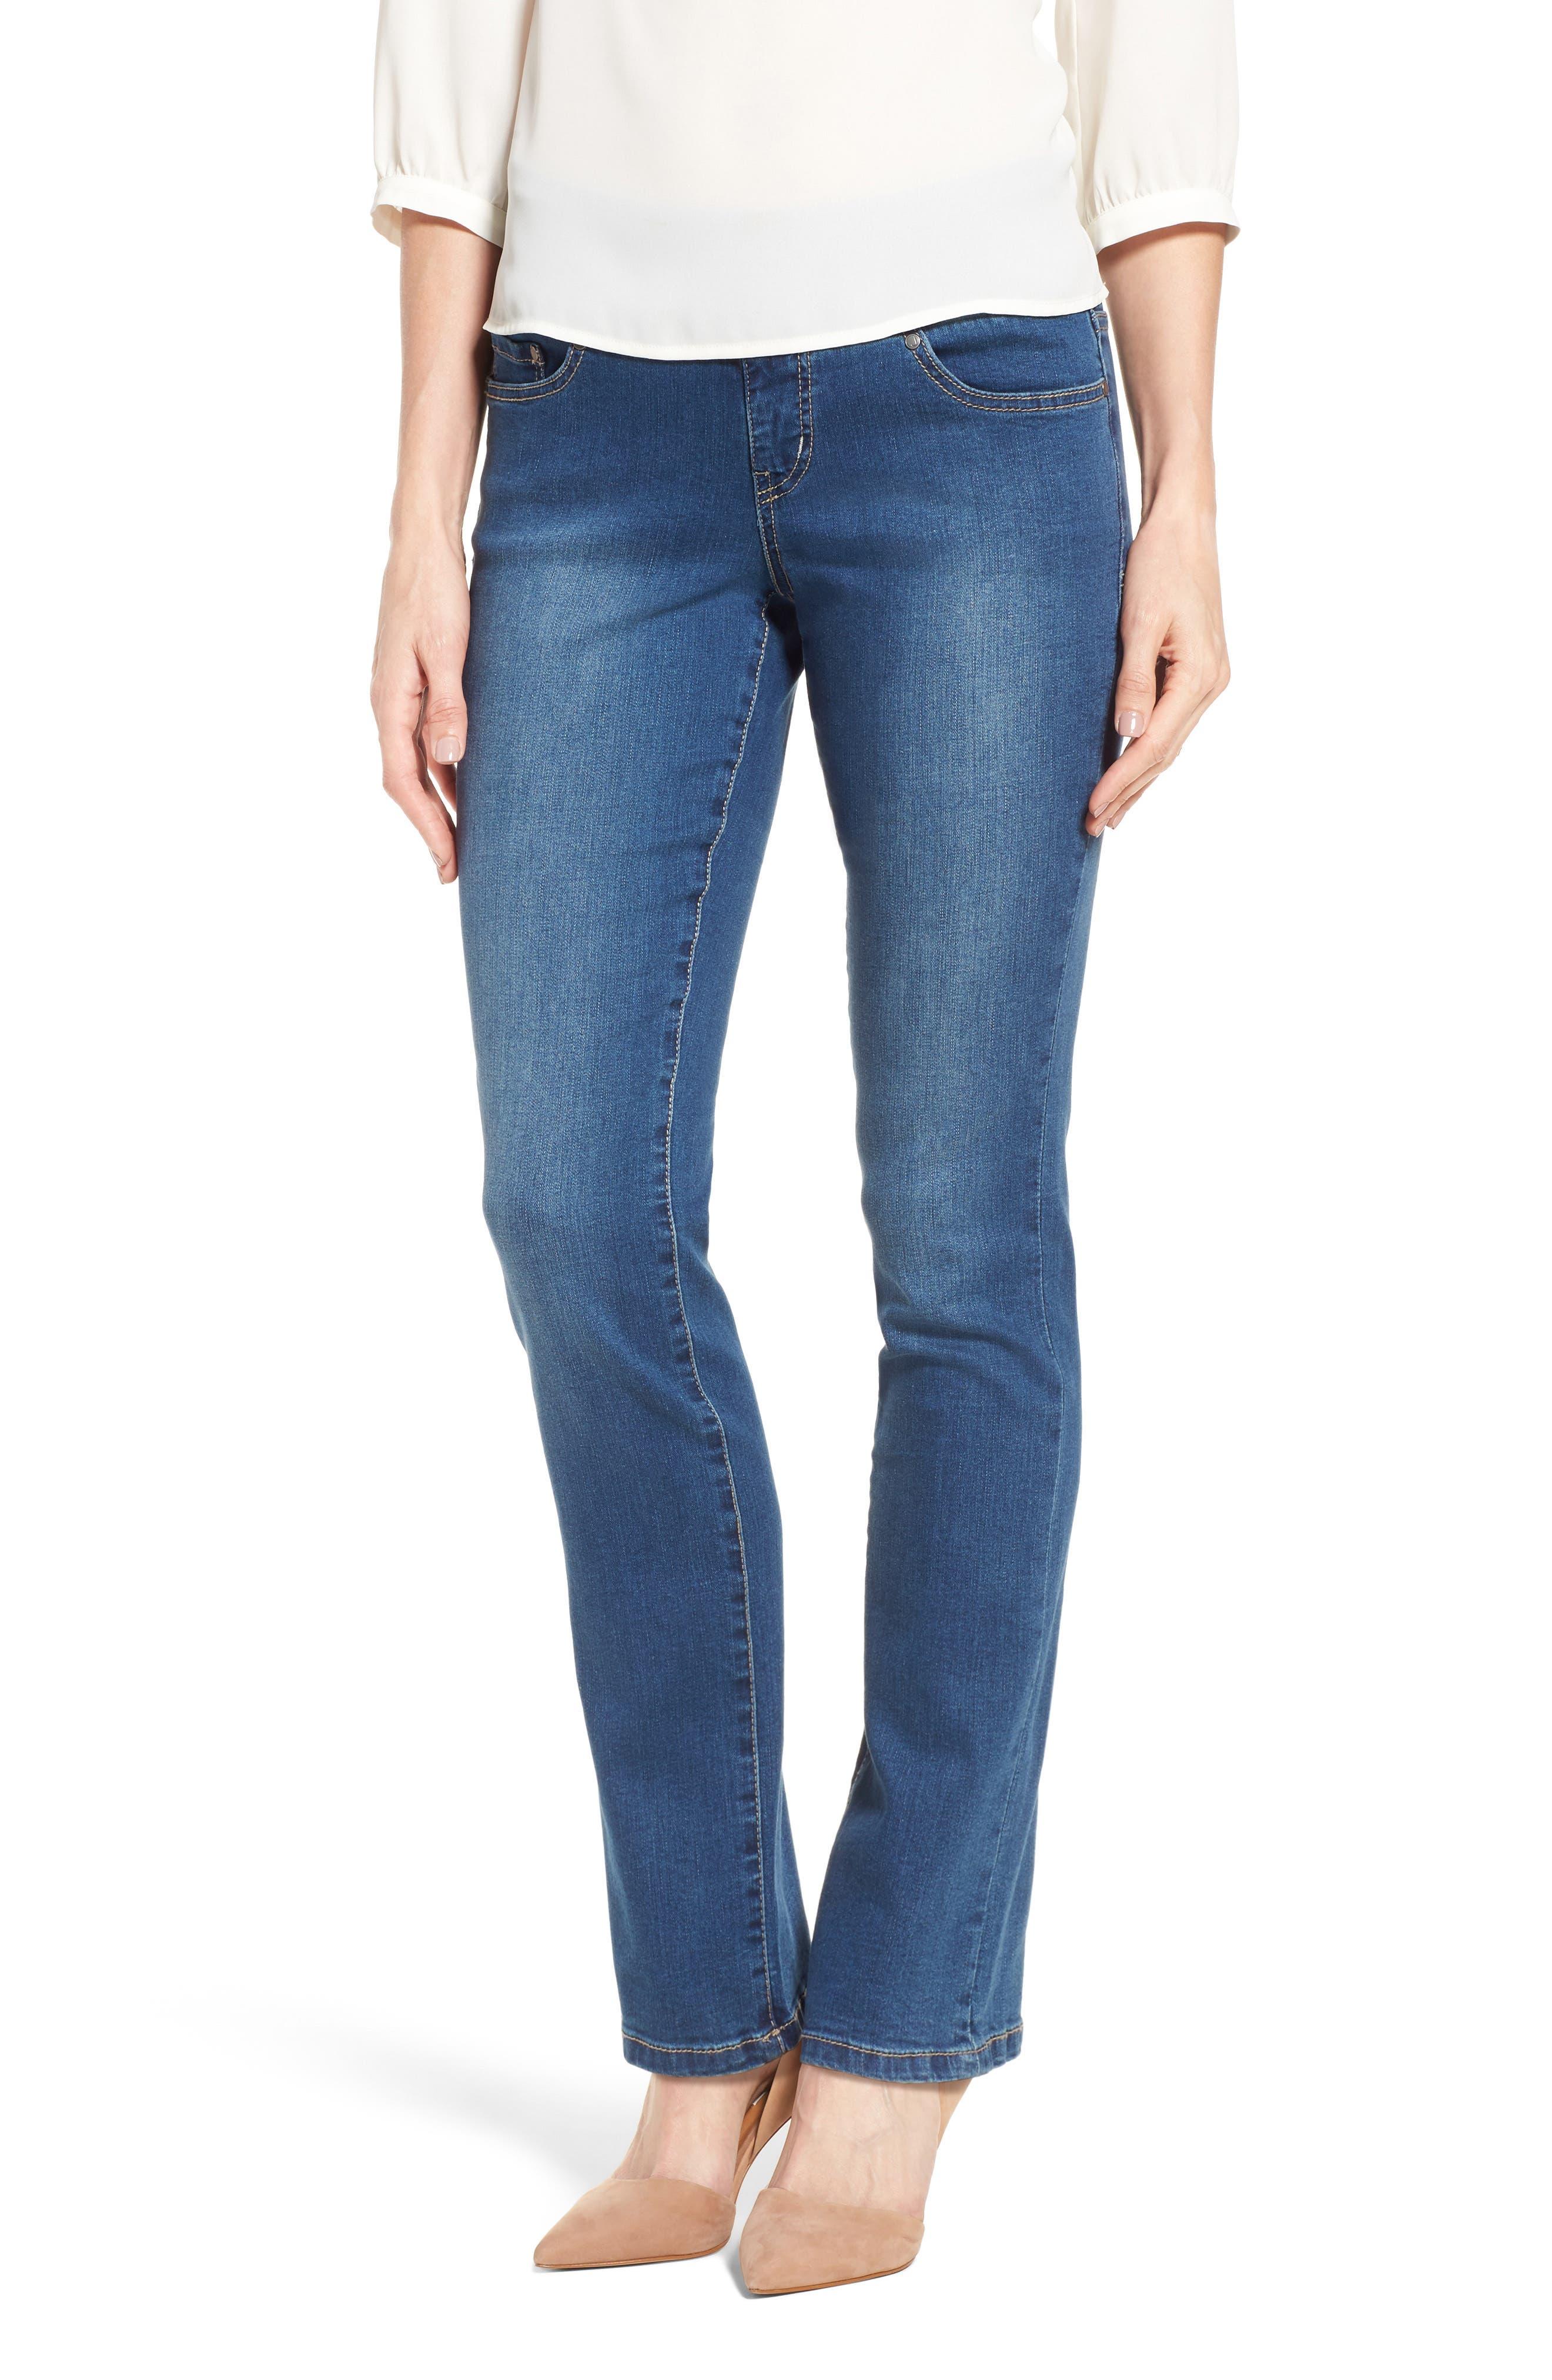 JAG JEANS, Peri Pull-On Straight Leg Jeans, Main thumbnail 1, color, MEDIUM INDIGO